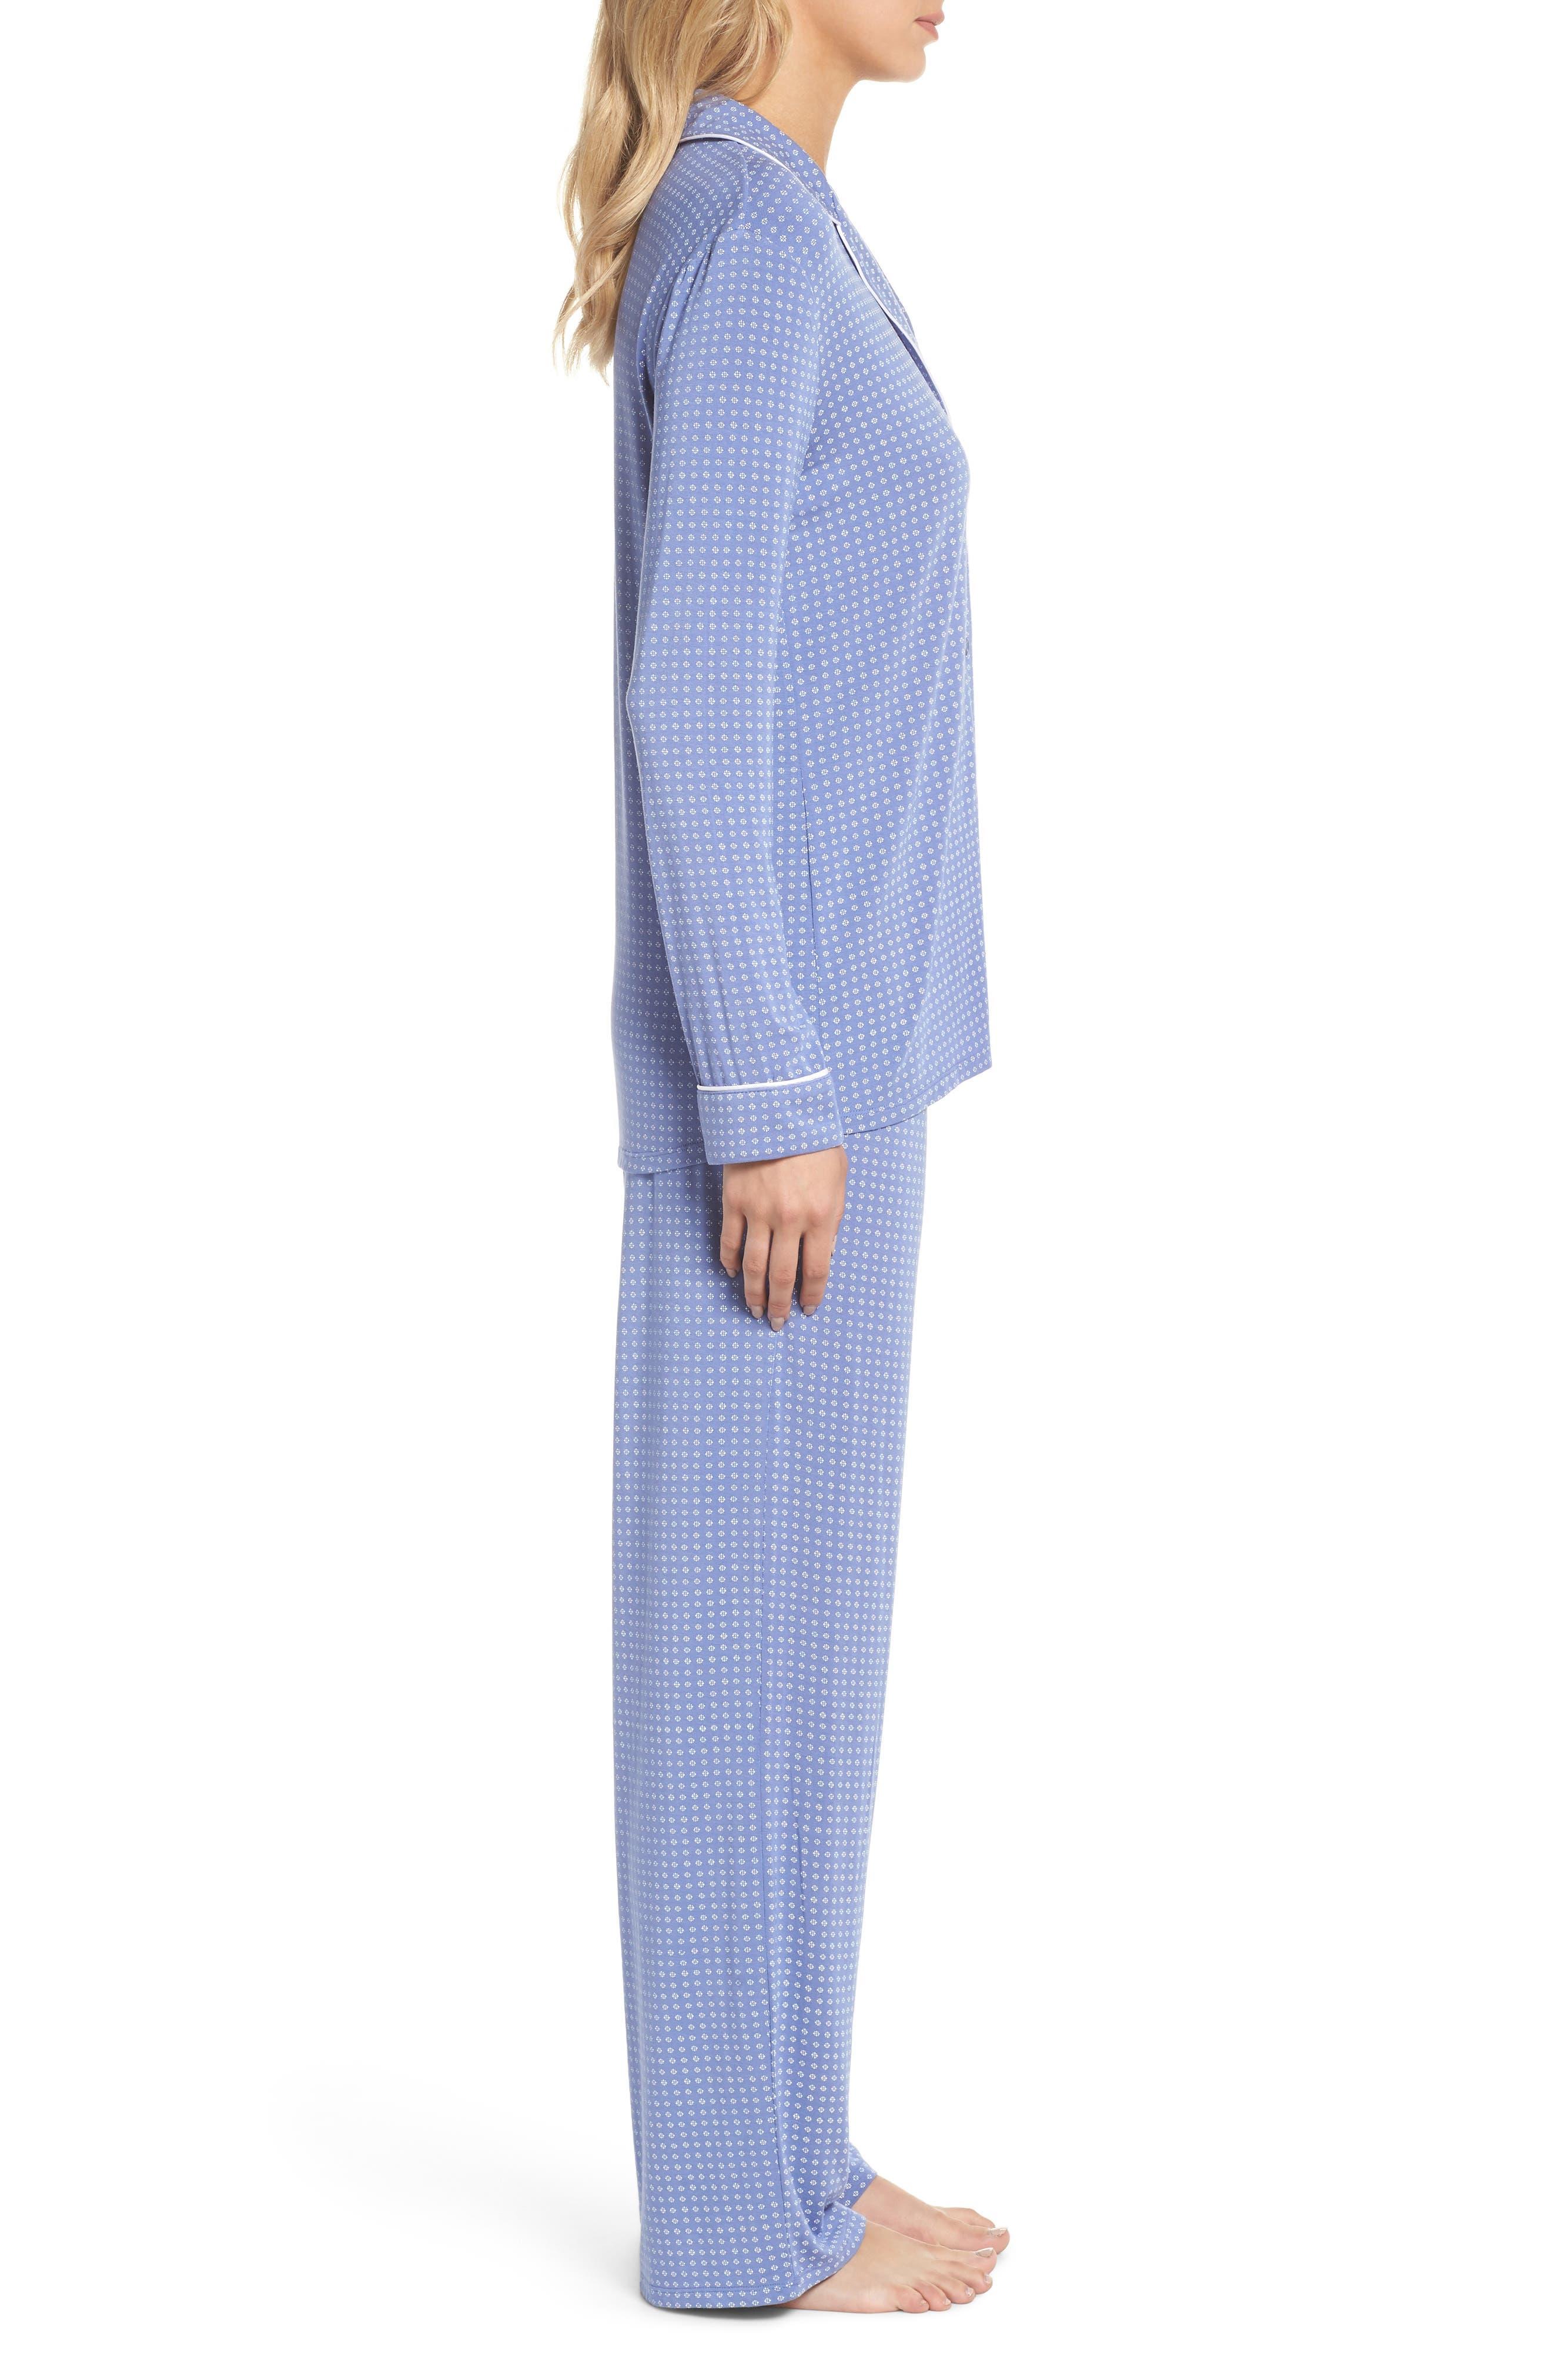 Moonlight Pajamas,                             Alternate thumbnail 3, color,                             Blue Denim Geo